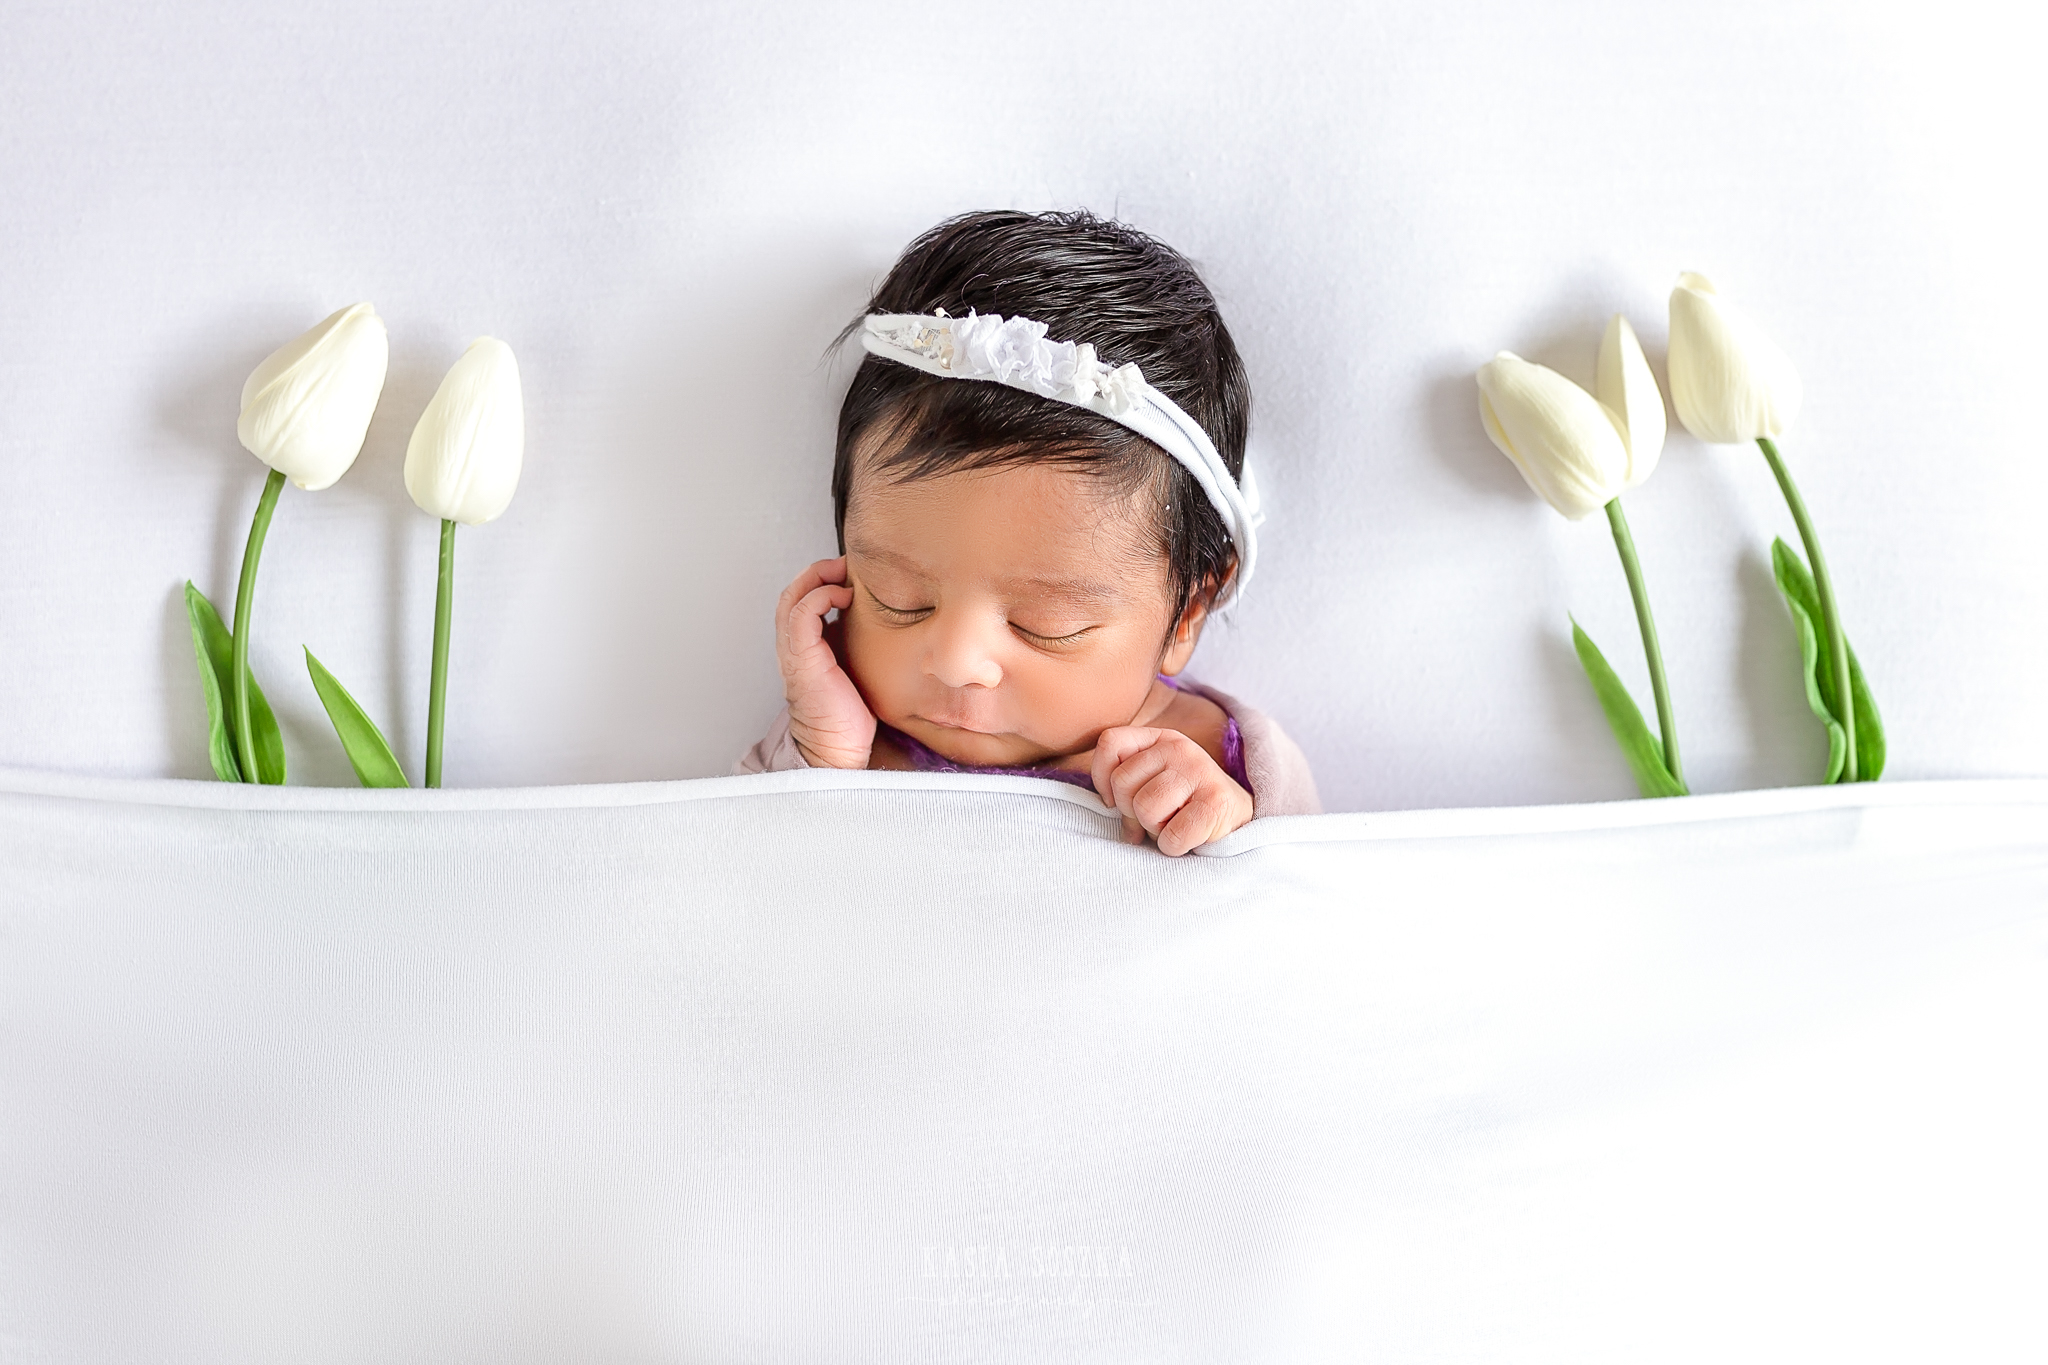 Newborn photography Leeds-Bradford-York-Harrogate: newborn baby girl sleeping in a white bed